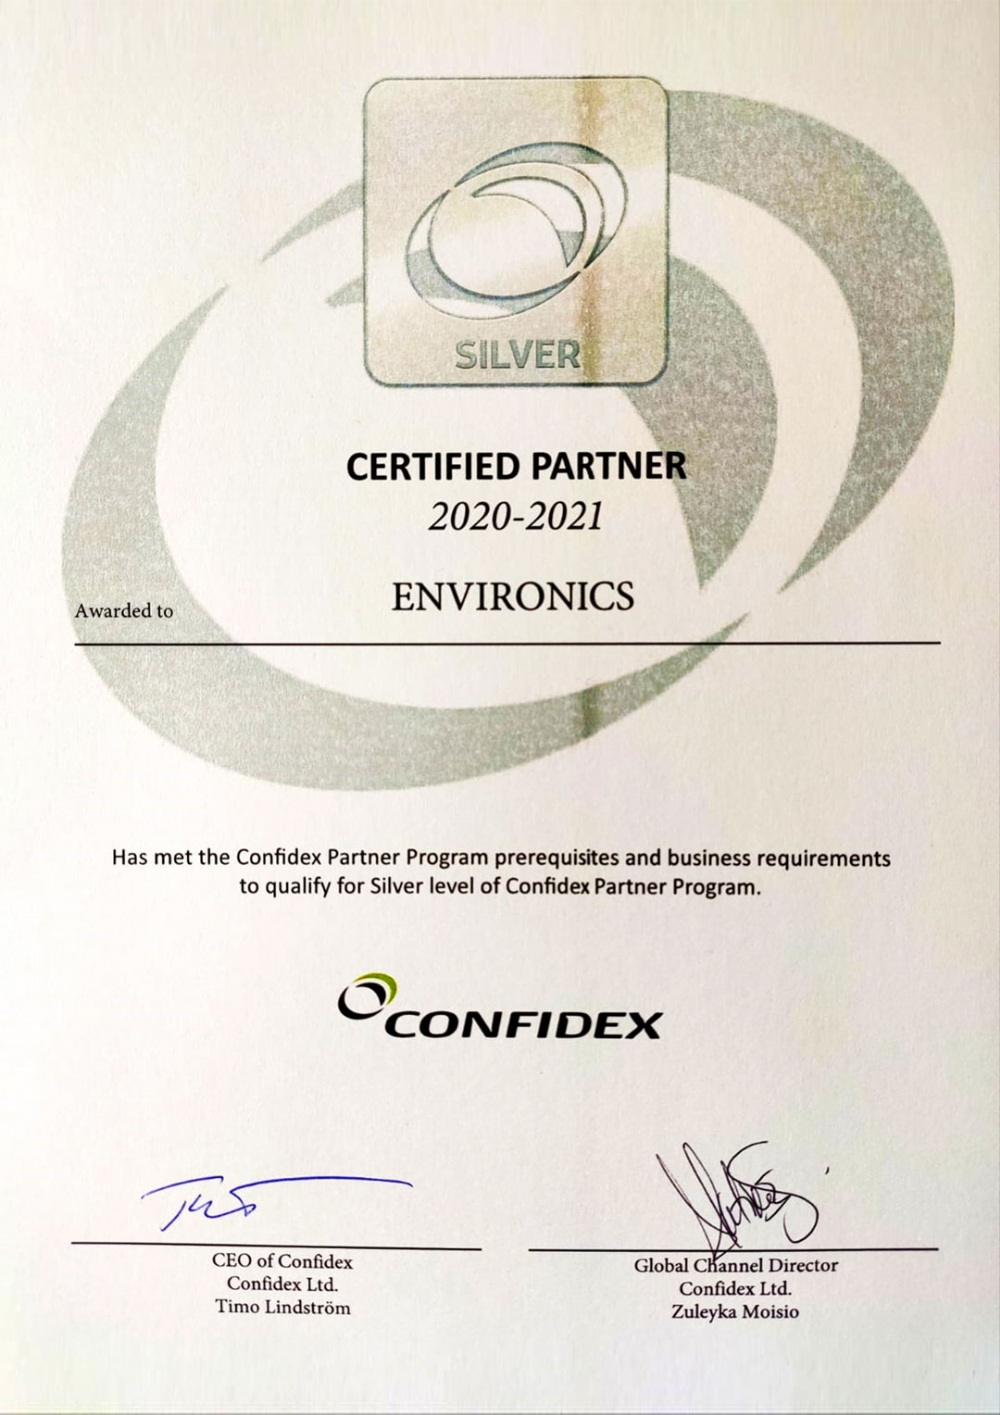 Confidex Akıllı Endüstriler